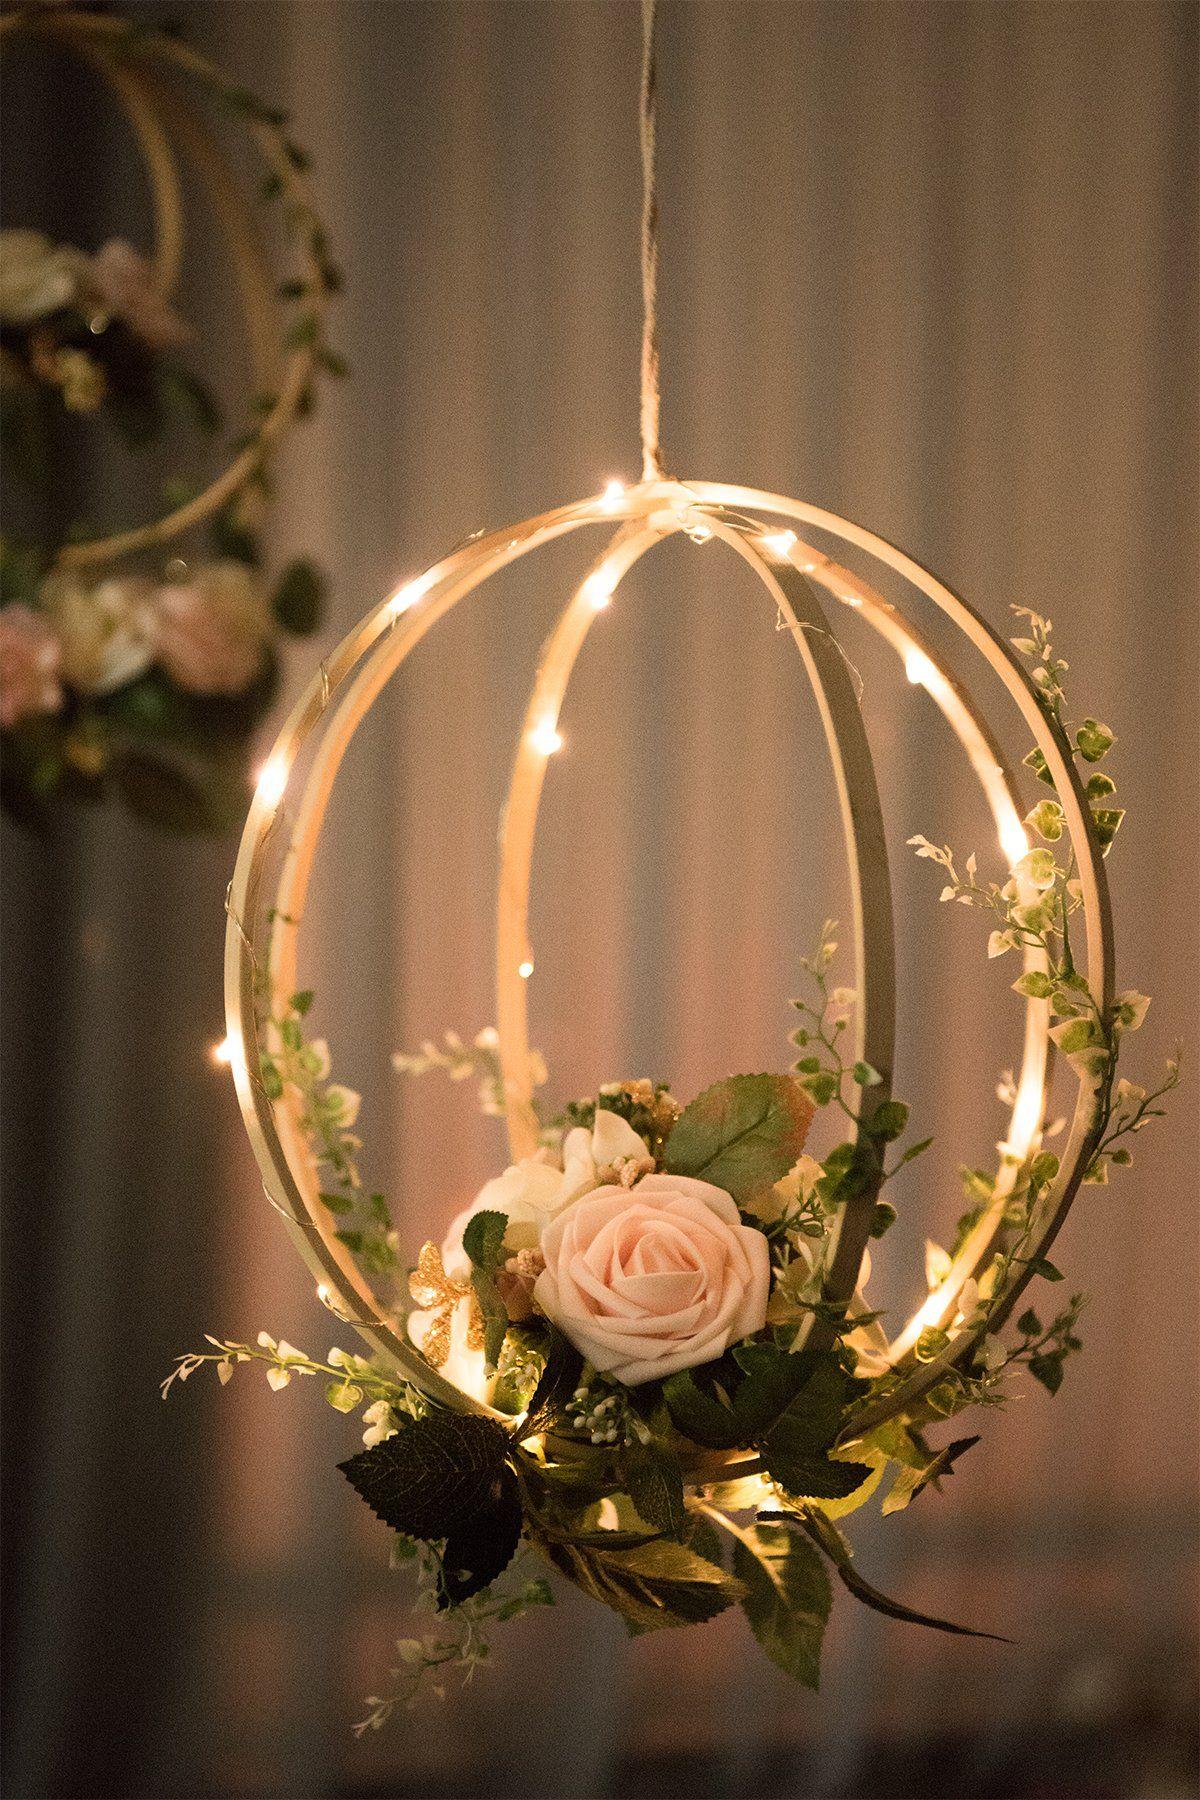 Blush Pink Floral Hoop Wreaths Set of 2 in 2019  Ideas